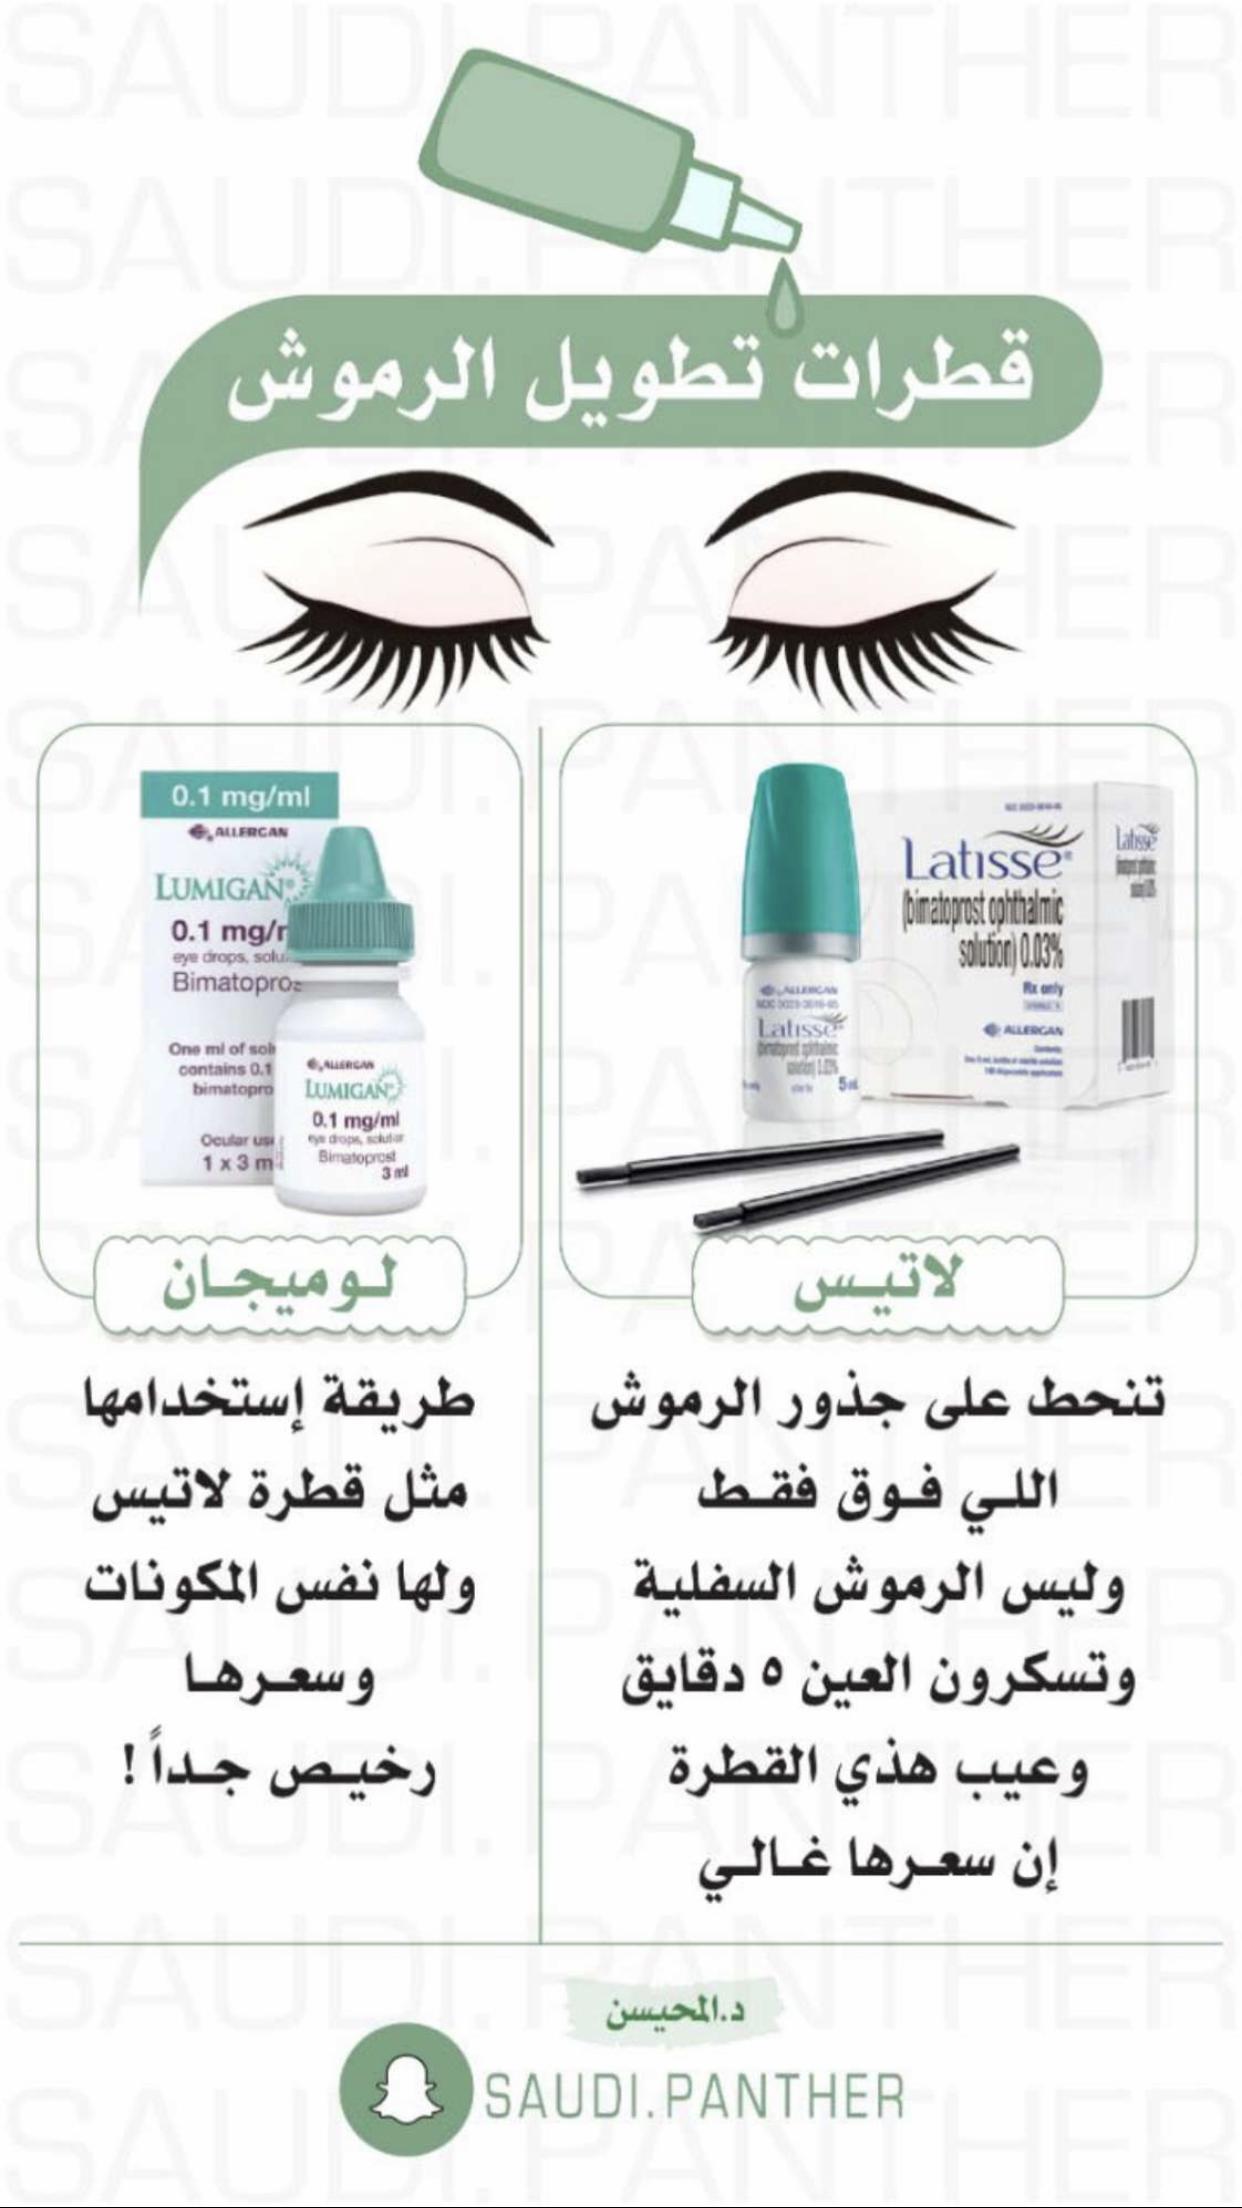 قطرة تطويل الرموش Beauty Skin Care Routine Hair Care Oils Beauty Skin Care